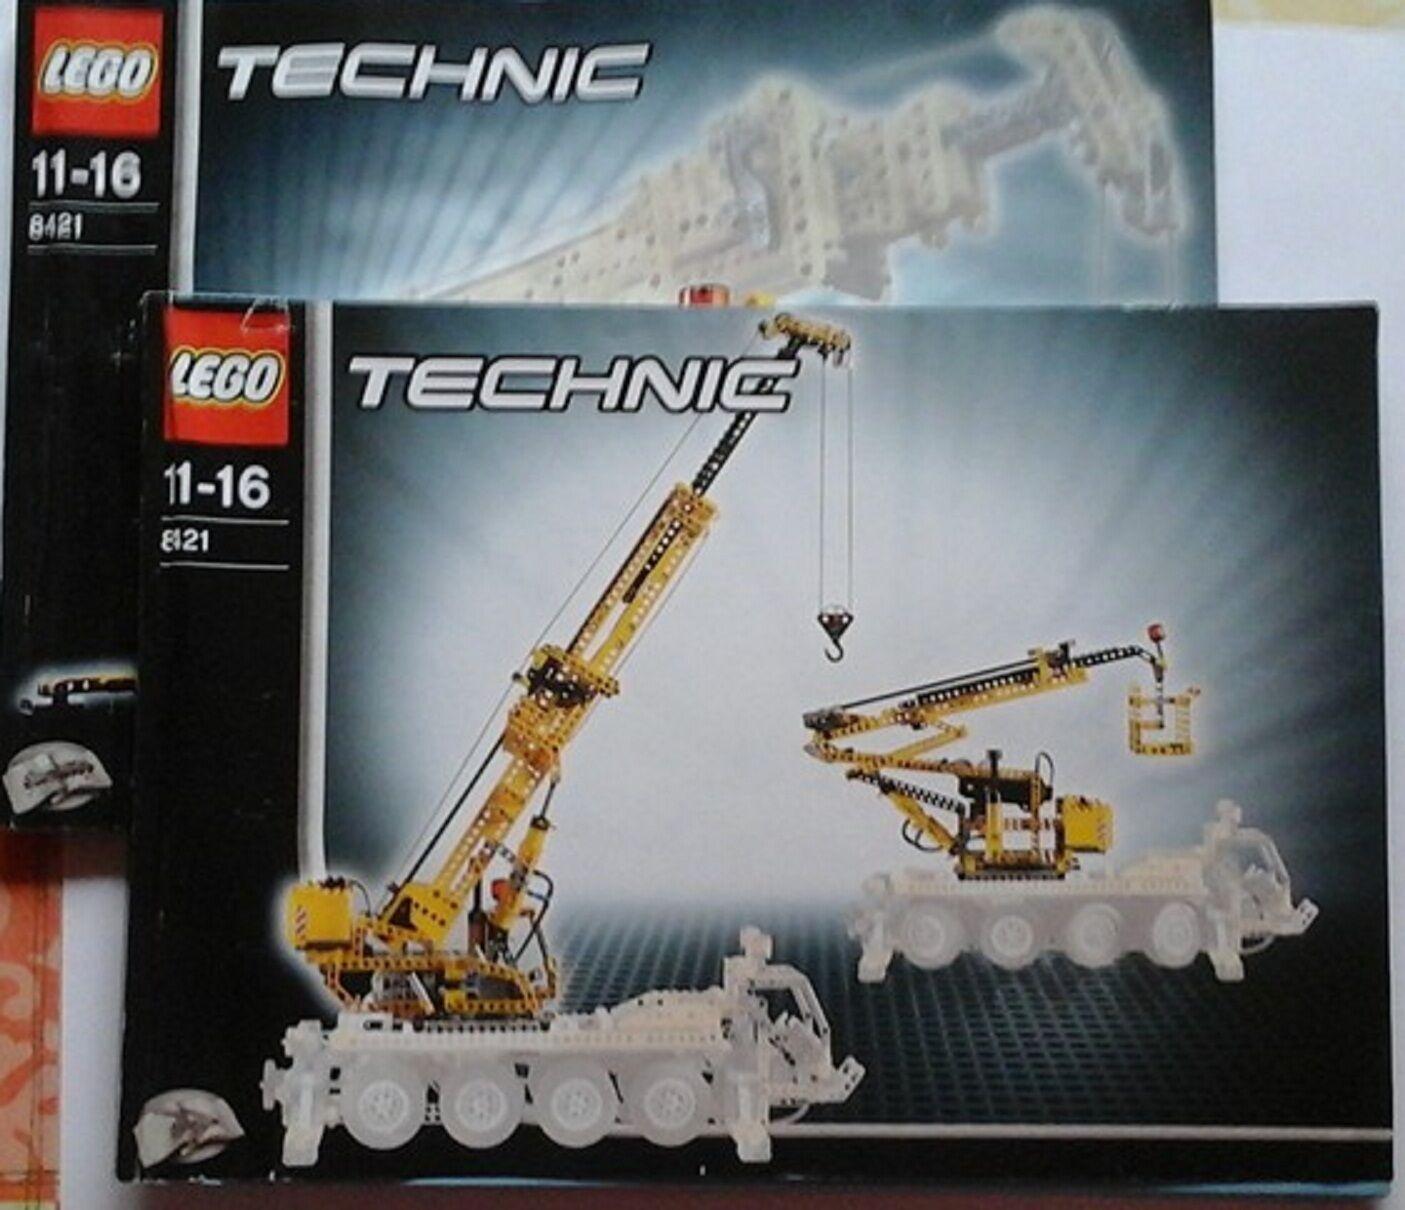 Lego Technic 8421 kranwagen con receta sin motor